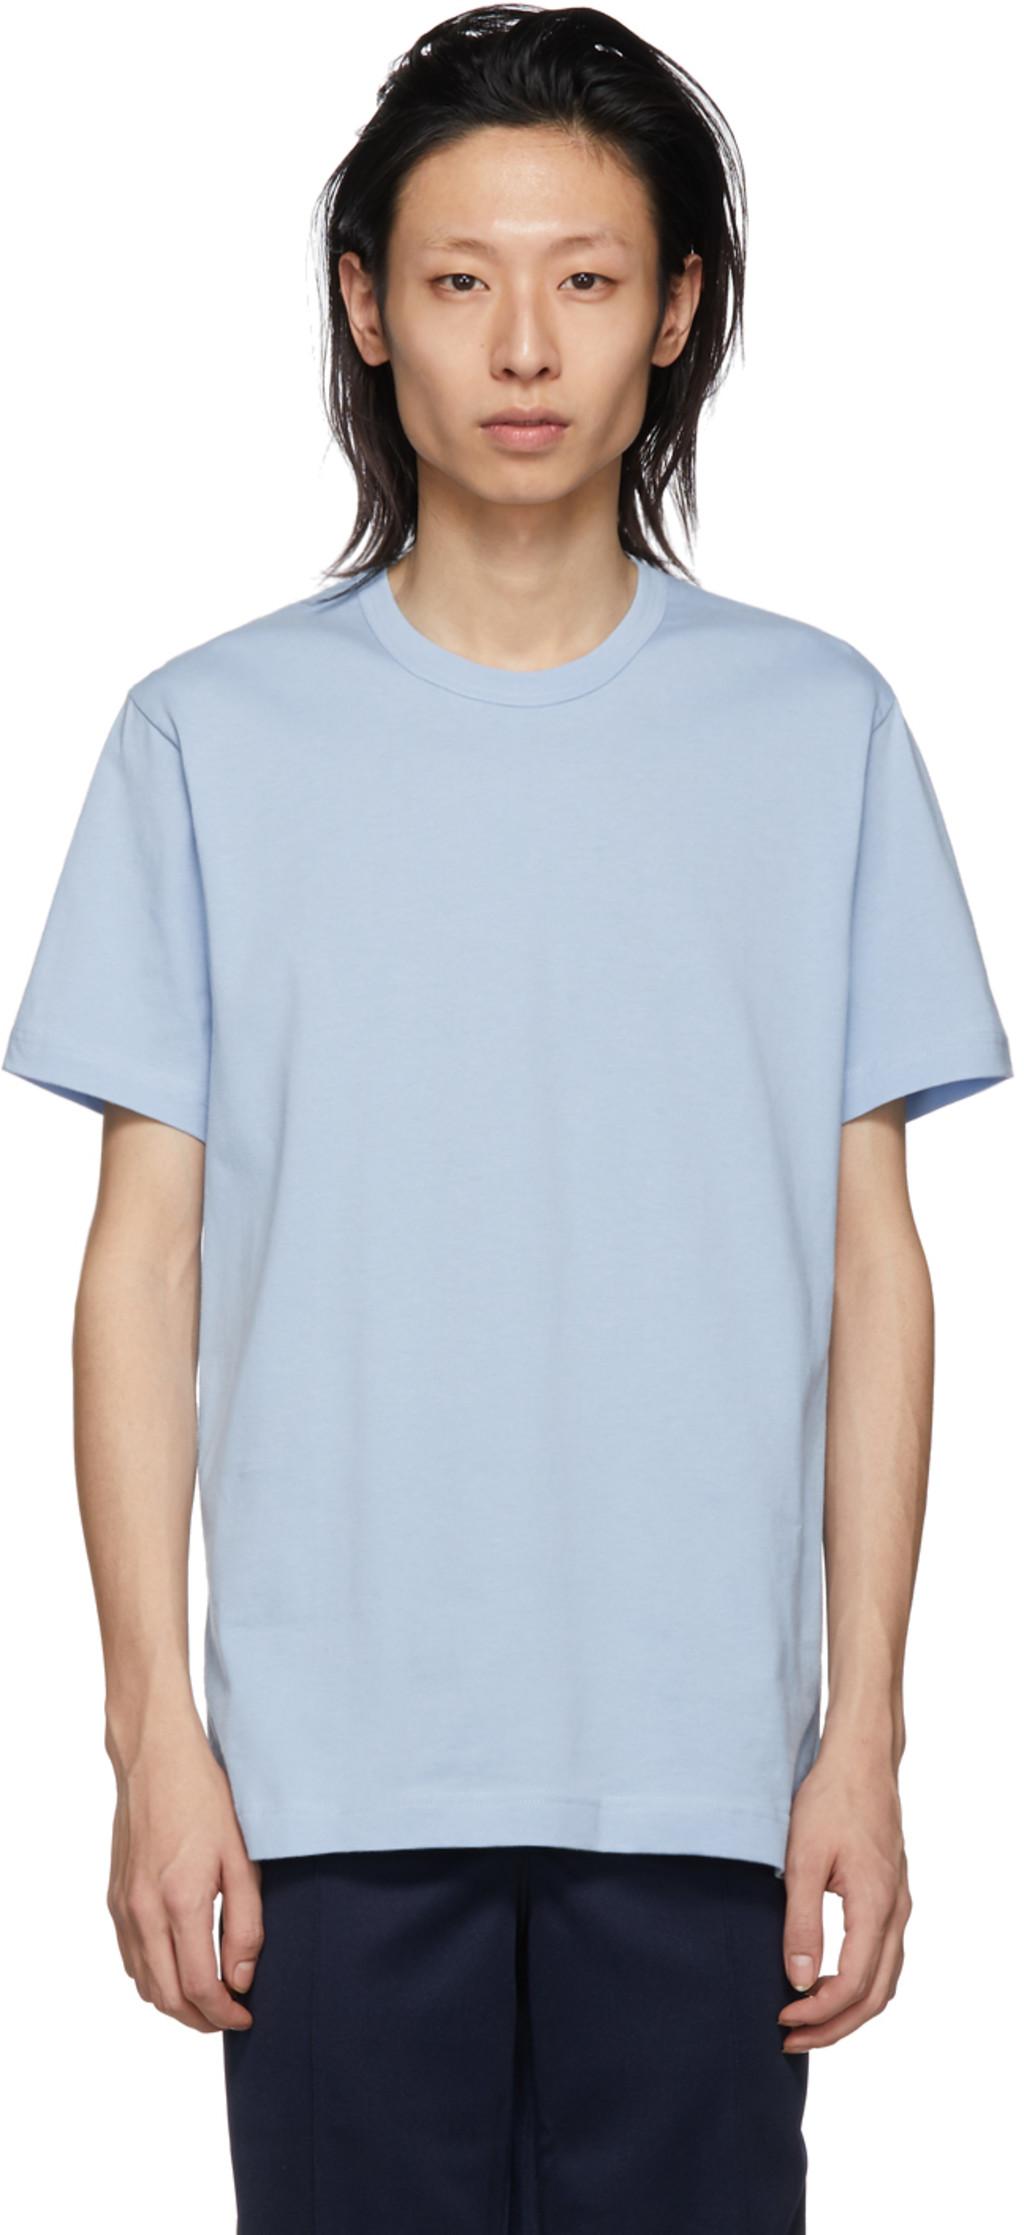 Designer T Shirts For Men Ssense